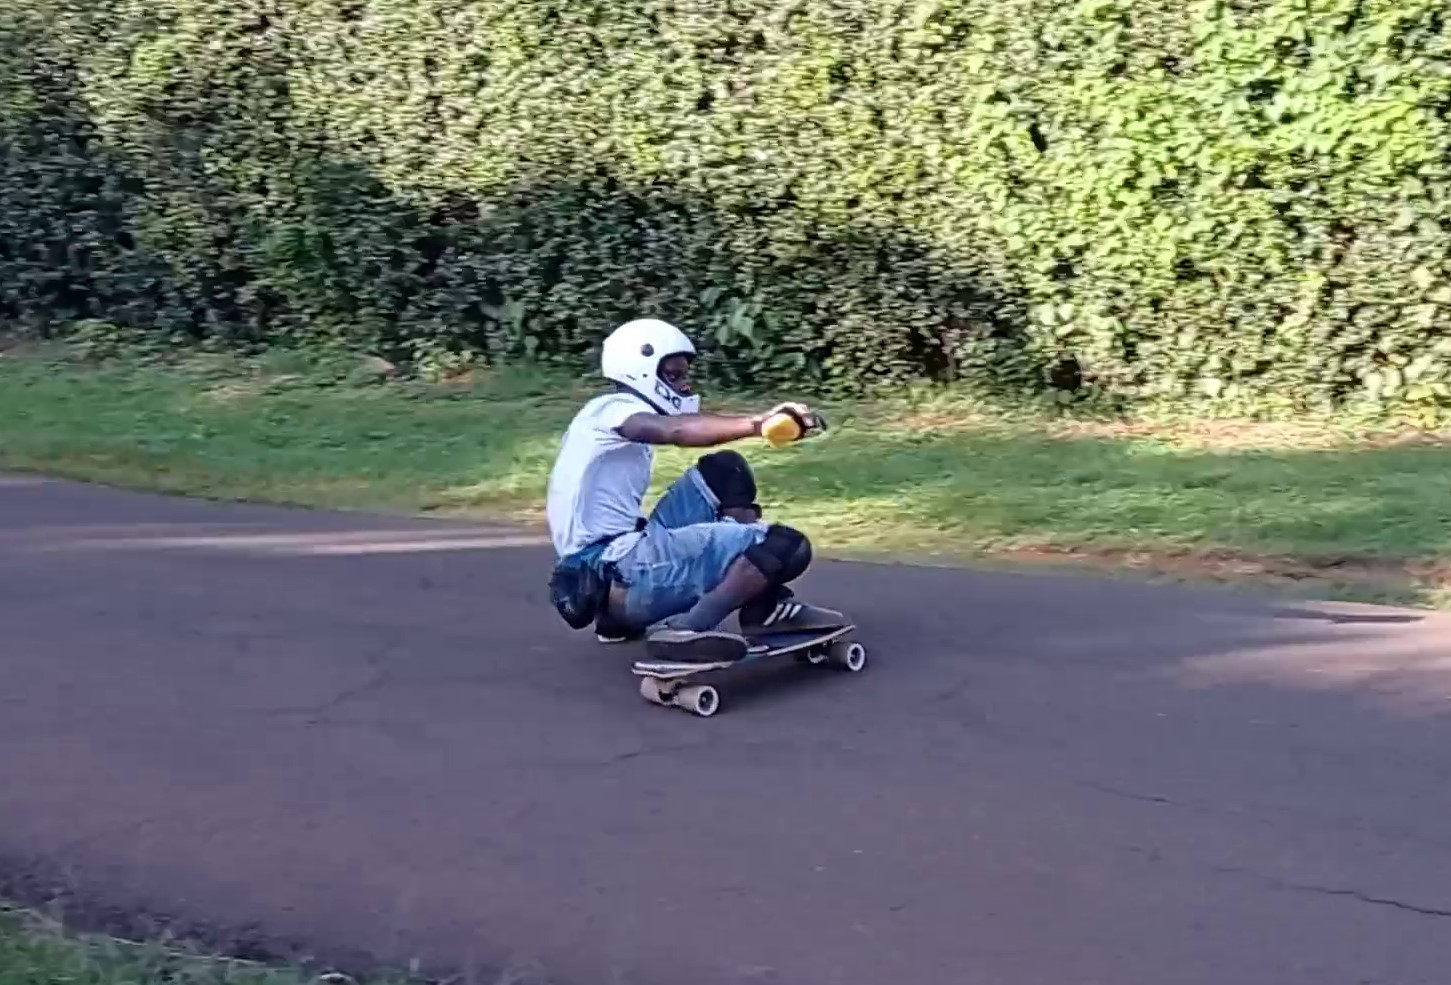 Abuga sliding his longboard on the Pro-Fluxx